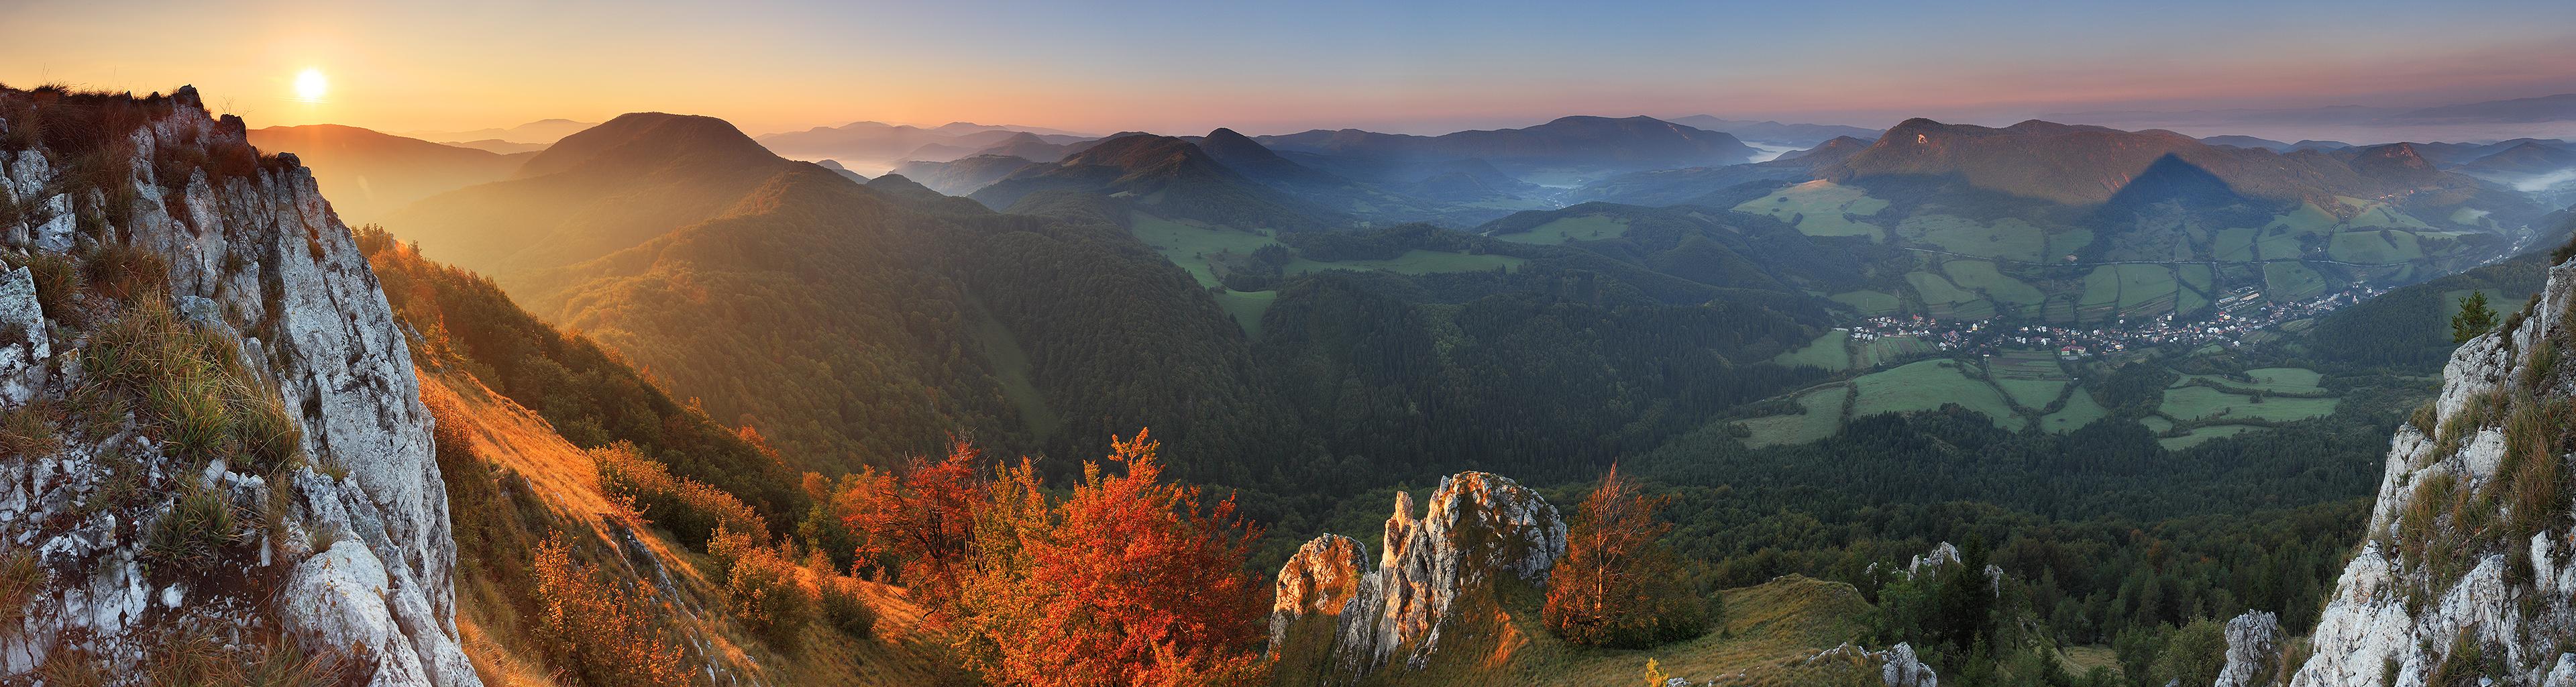 осенний, закат, в горах